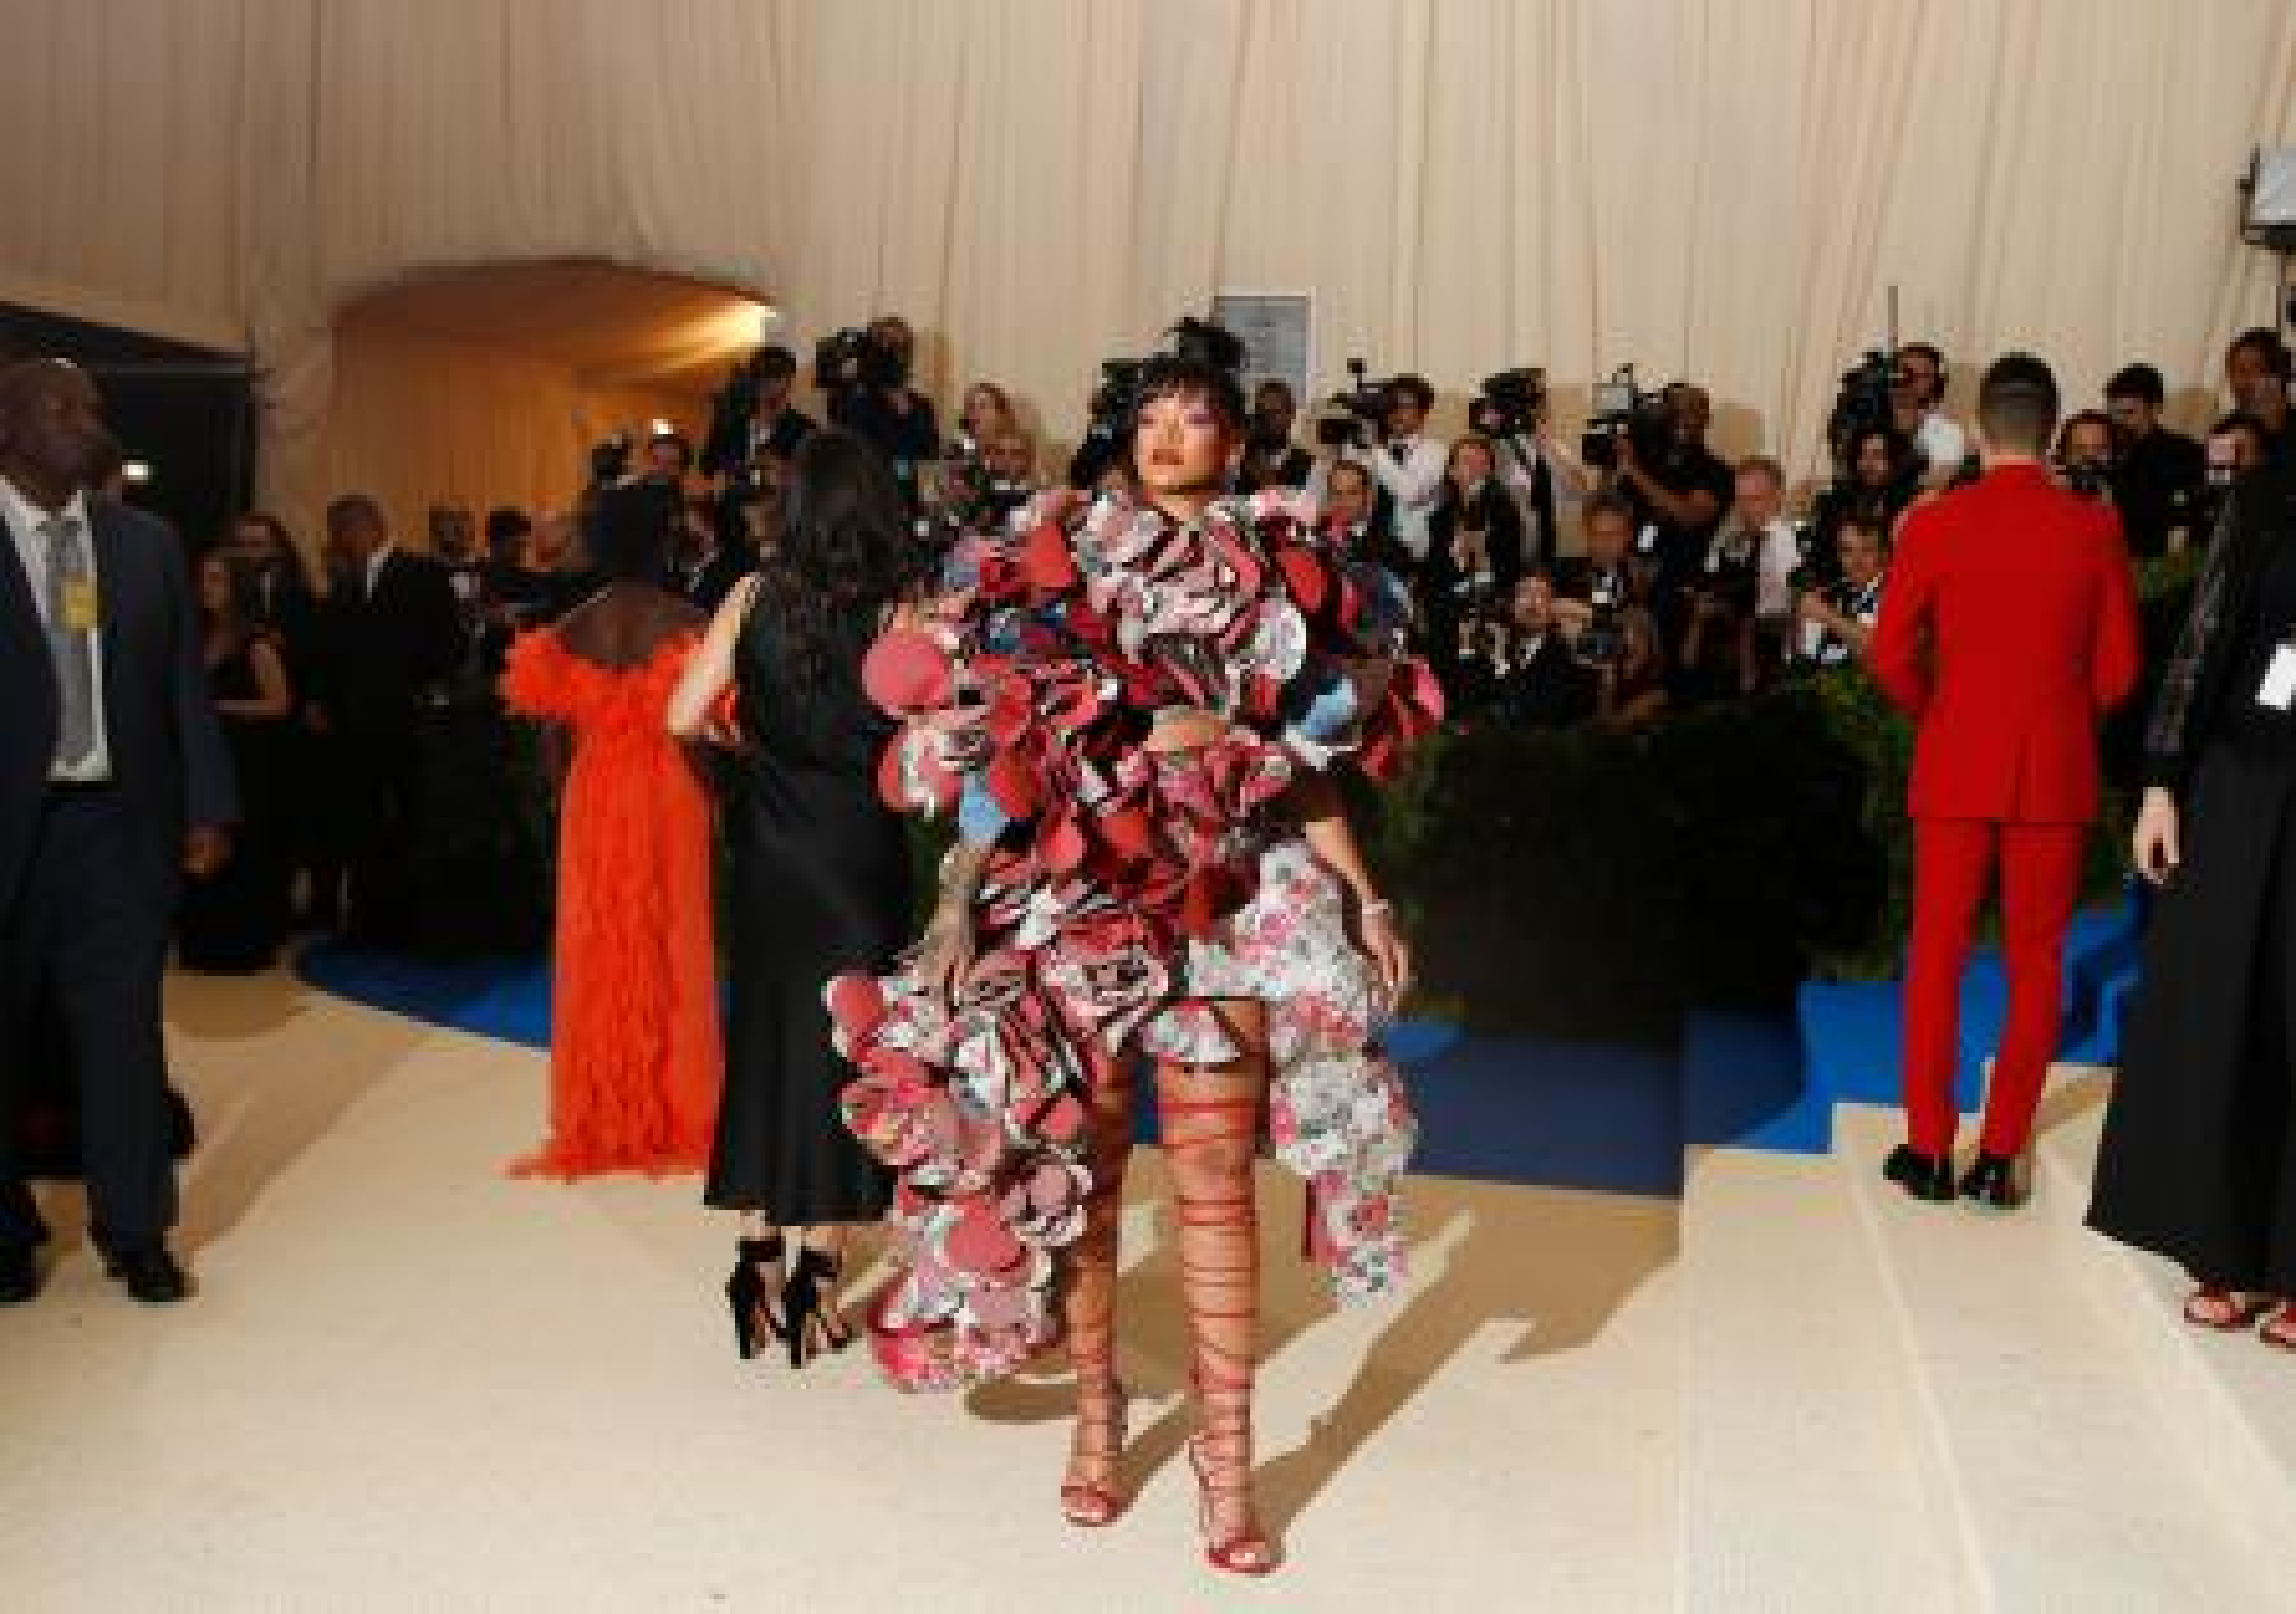 Metropolitan Museum of Art Costume Institute Gala - Rei Kawakubo/Comme des Garcons: Art of the In-Between - Arrivals - New York City, U.S. - 01/05/17 - Rihanna. REUTERS/Carlo Allegri - RTS14PUP